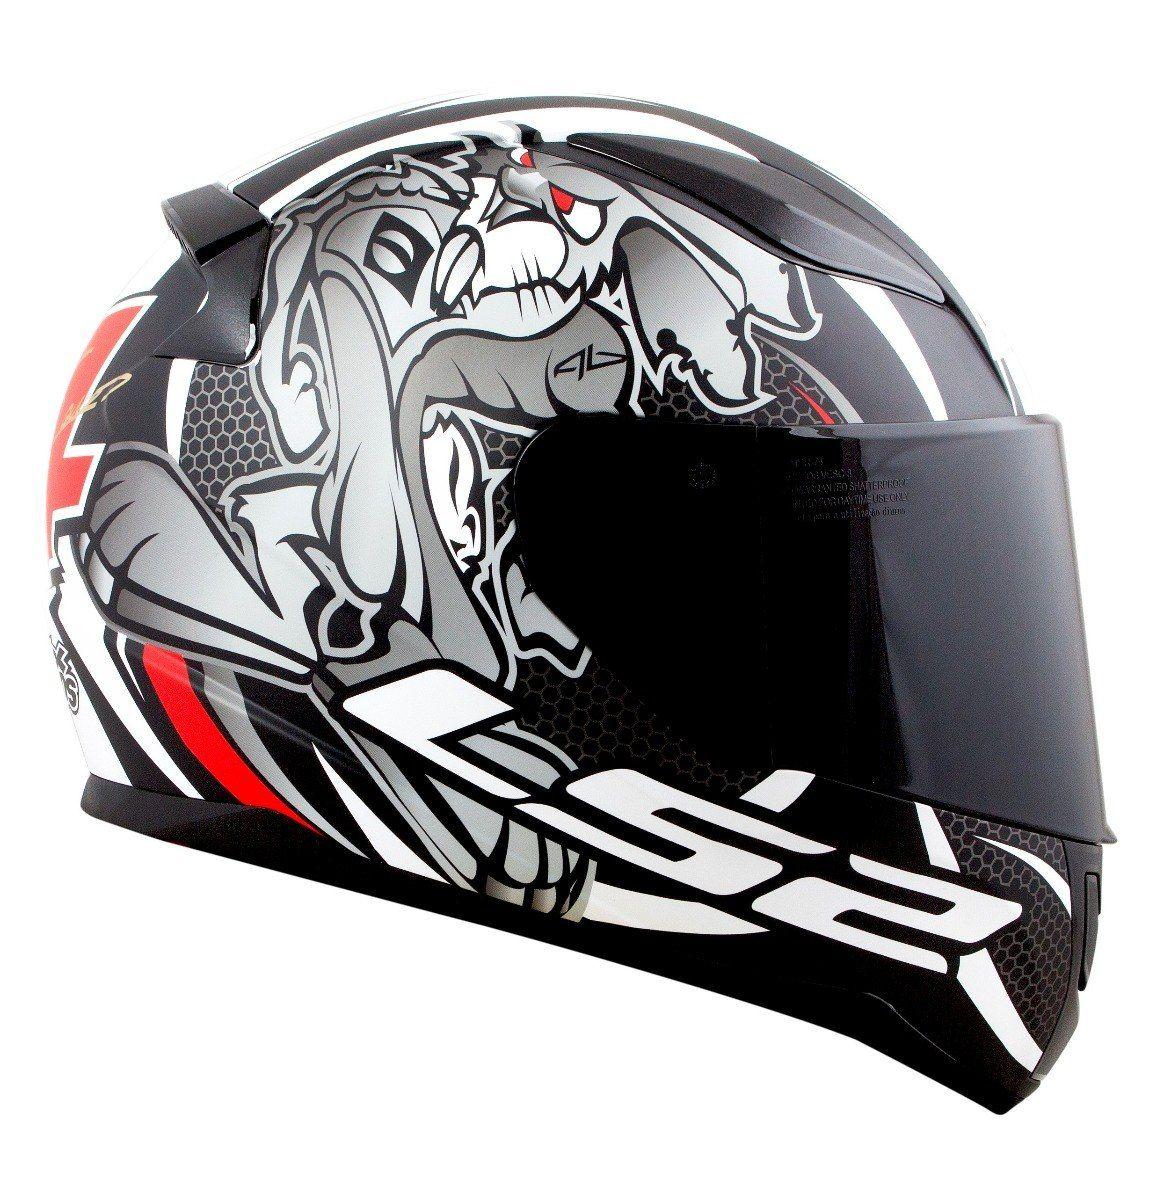 CAPACETE RAPID FF353 ALEX BARROS FOSCO - LS2  - Motosports